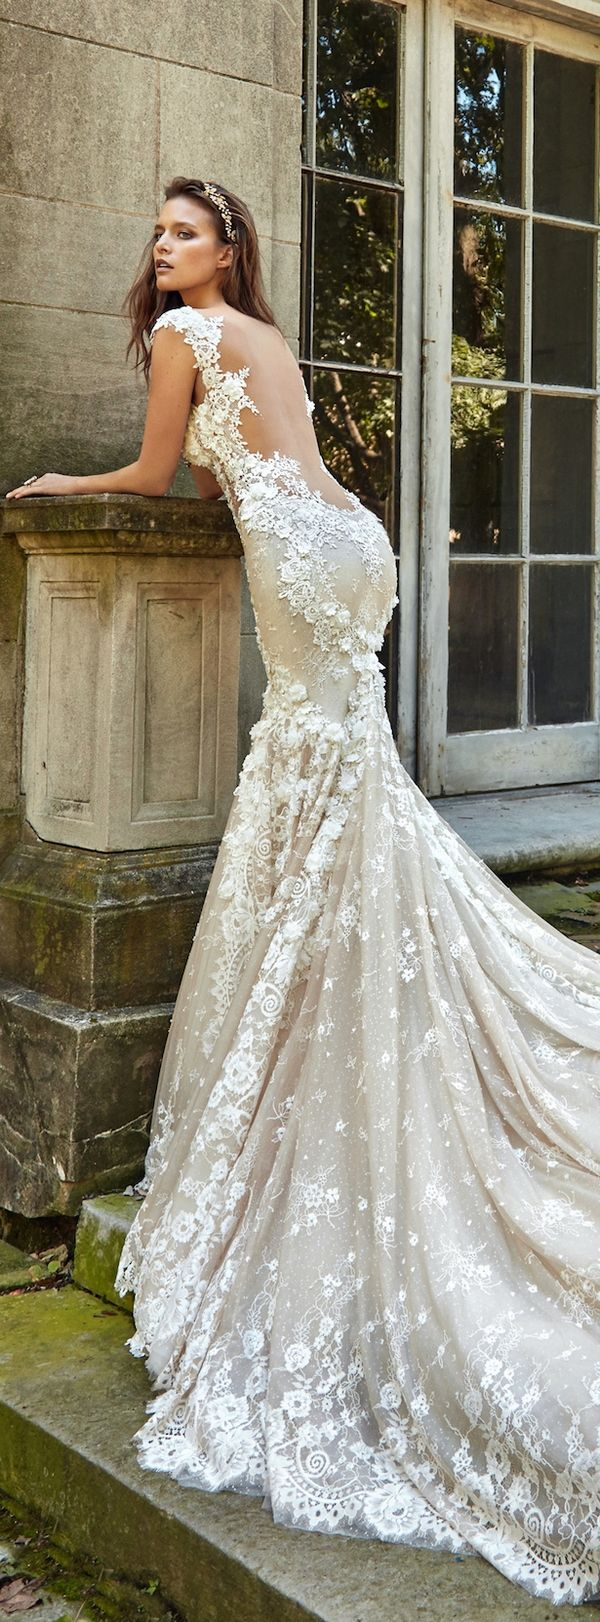 Galia Lahav 2017 Wedding Dresses 227 best